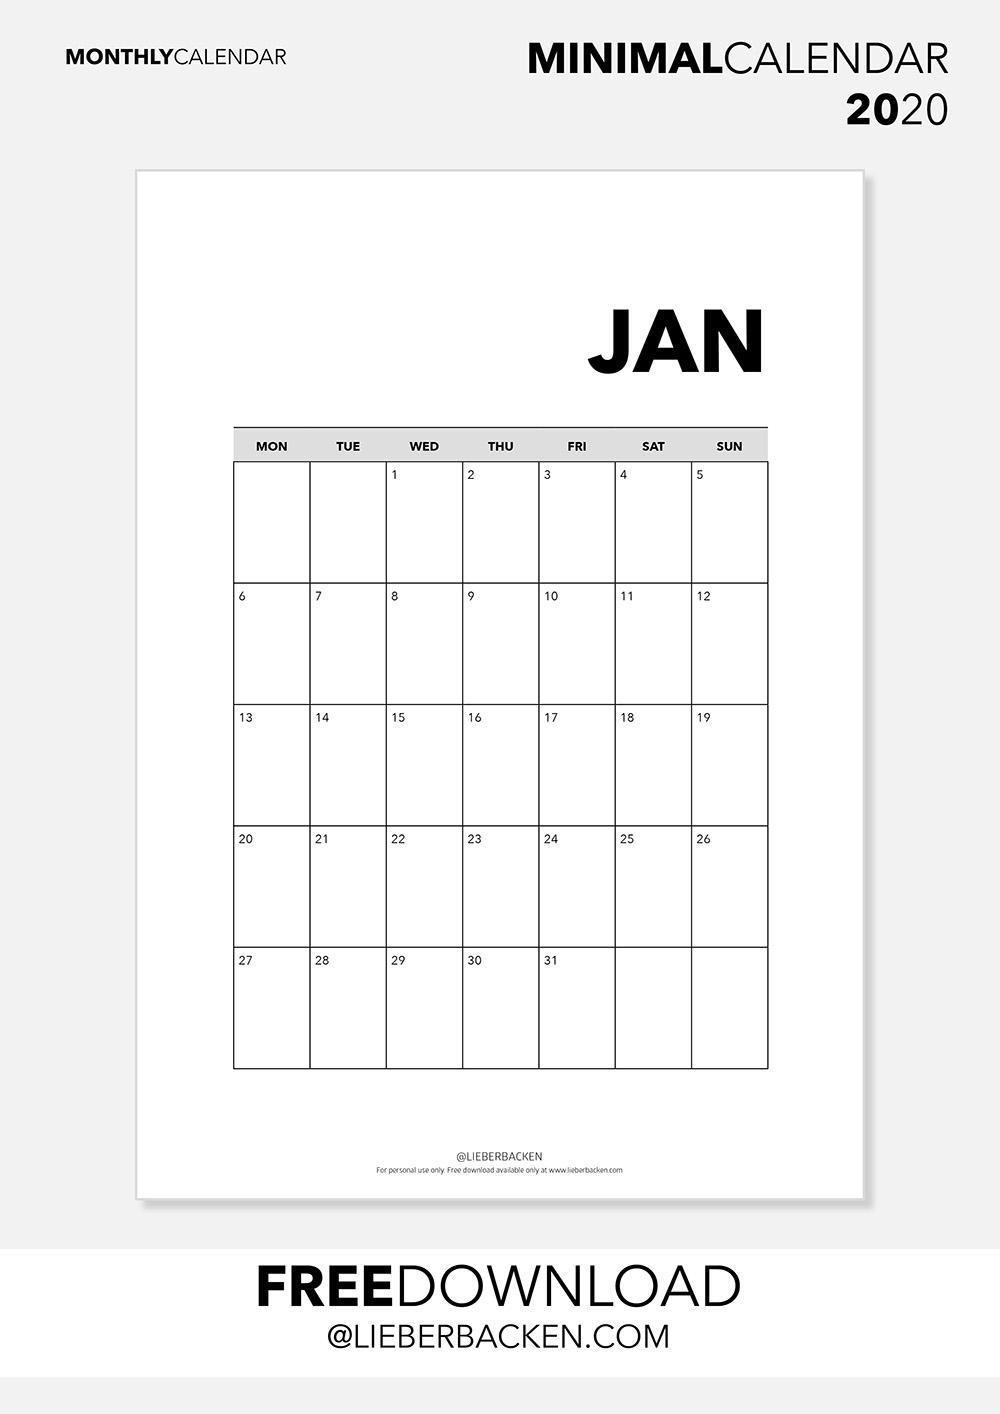 Monthly Overview - Free Printable Calender 2020 | Gratis Download Kalender 2020